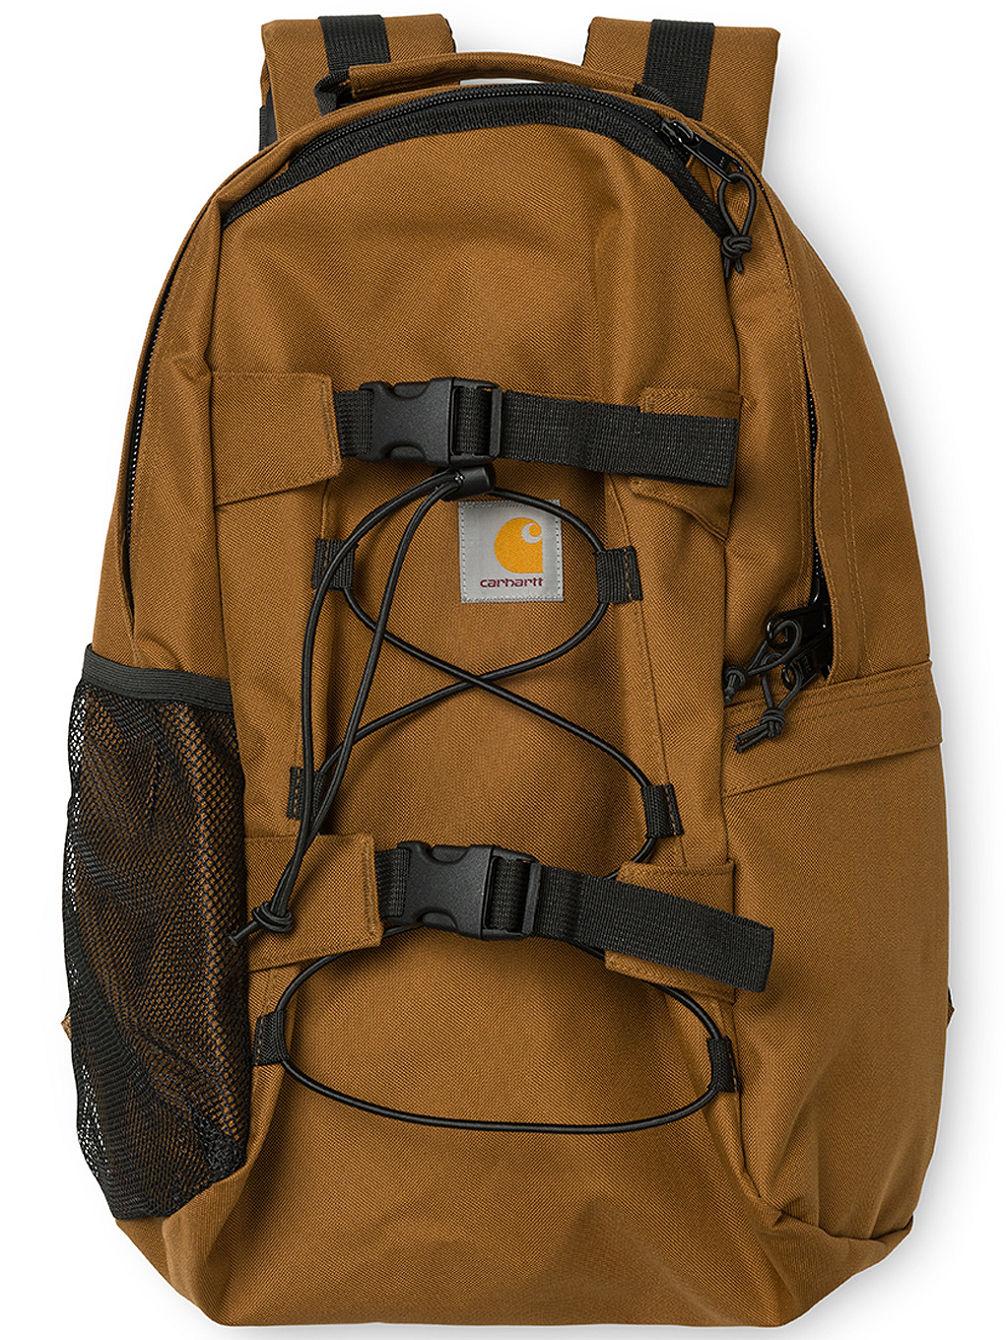 5f8b52b1a8 Buy Carhartt WIP Kickflip Backpack online at Blue Tomato